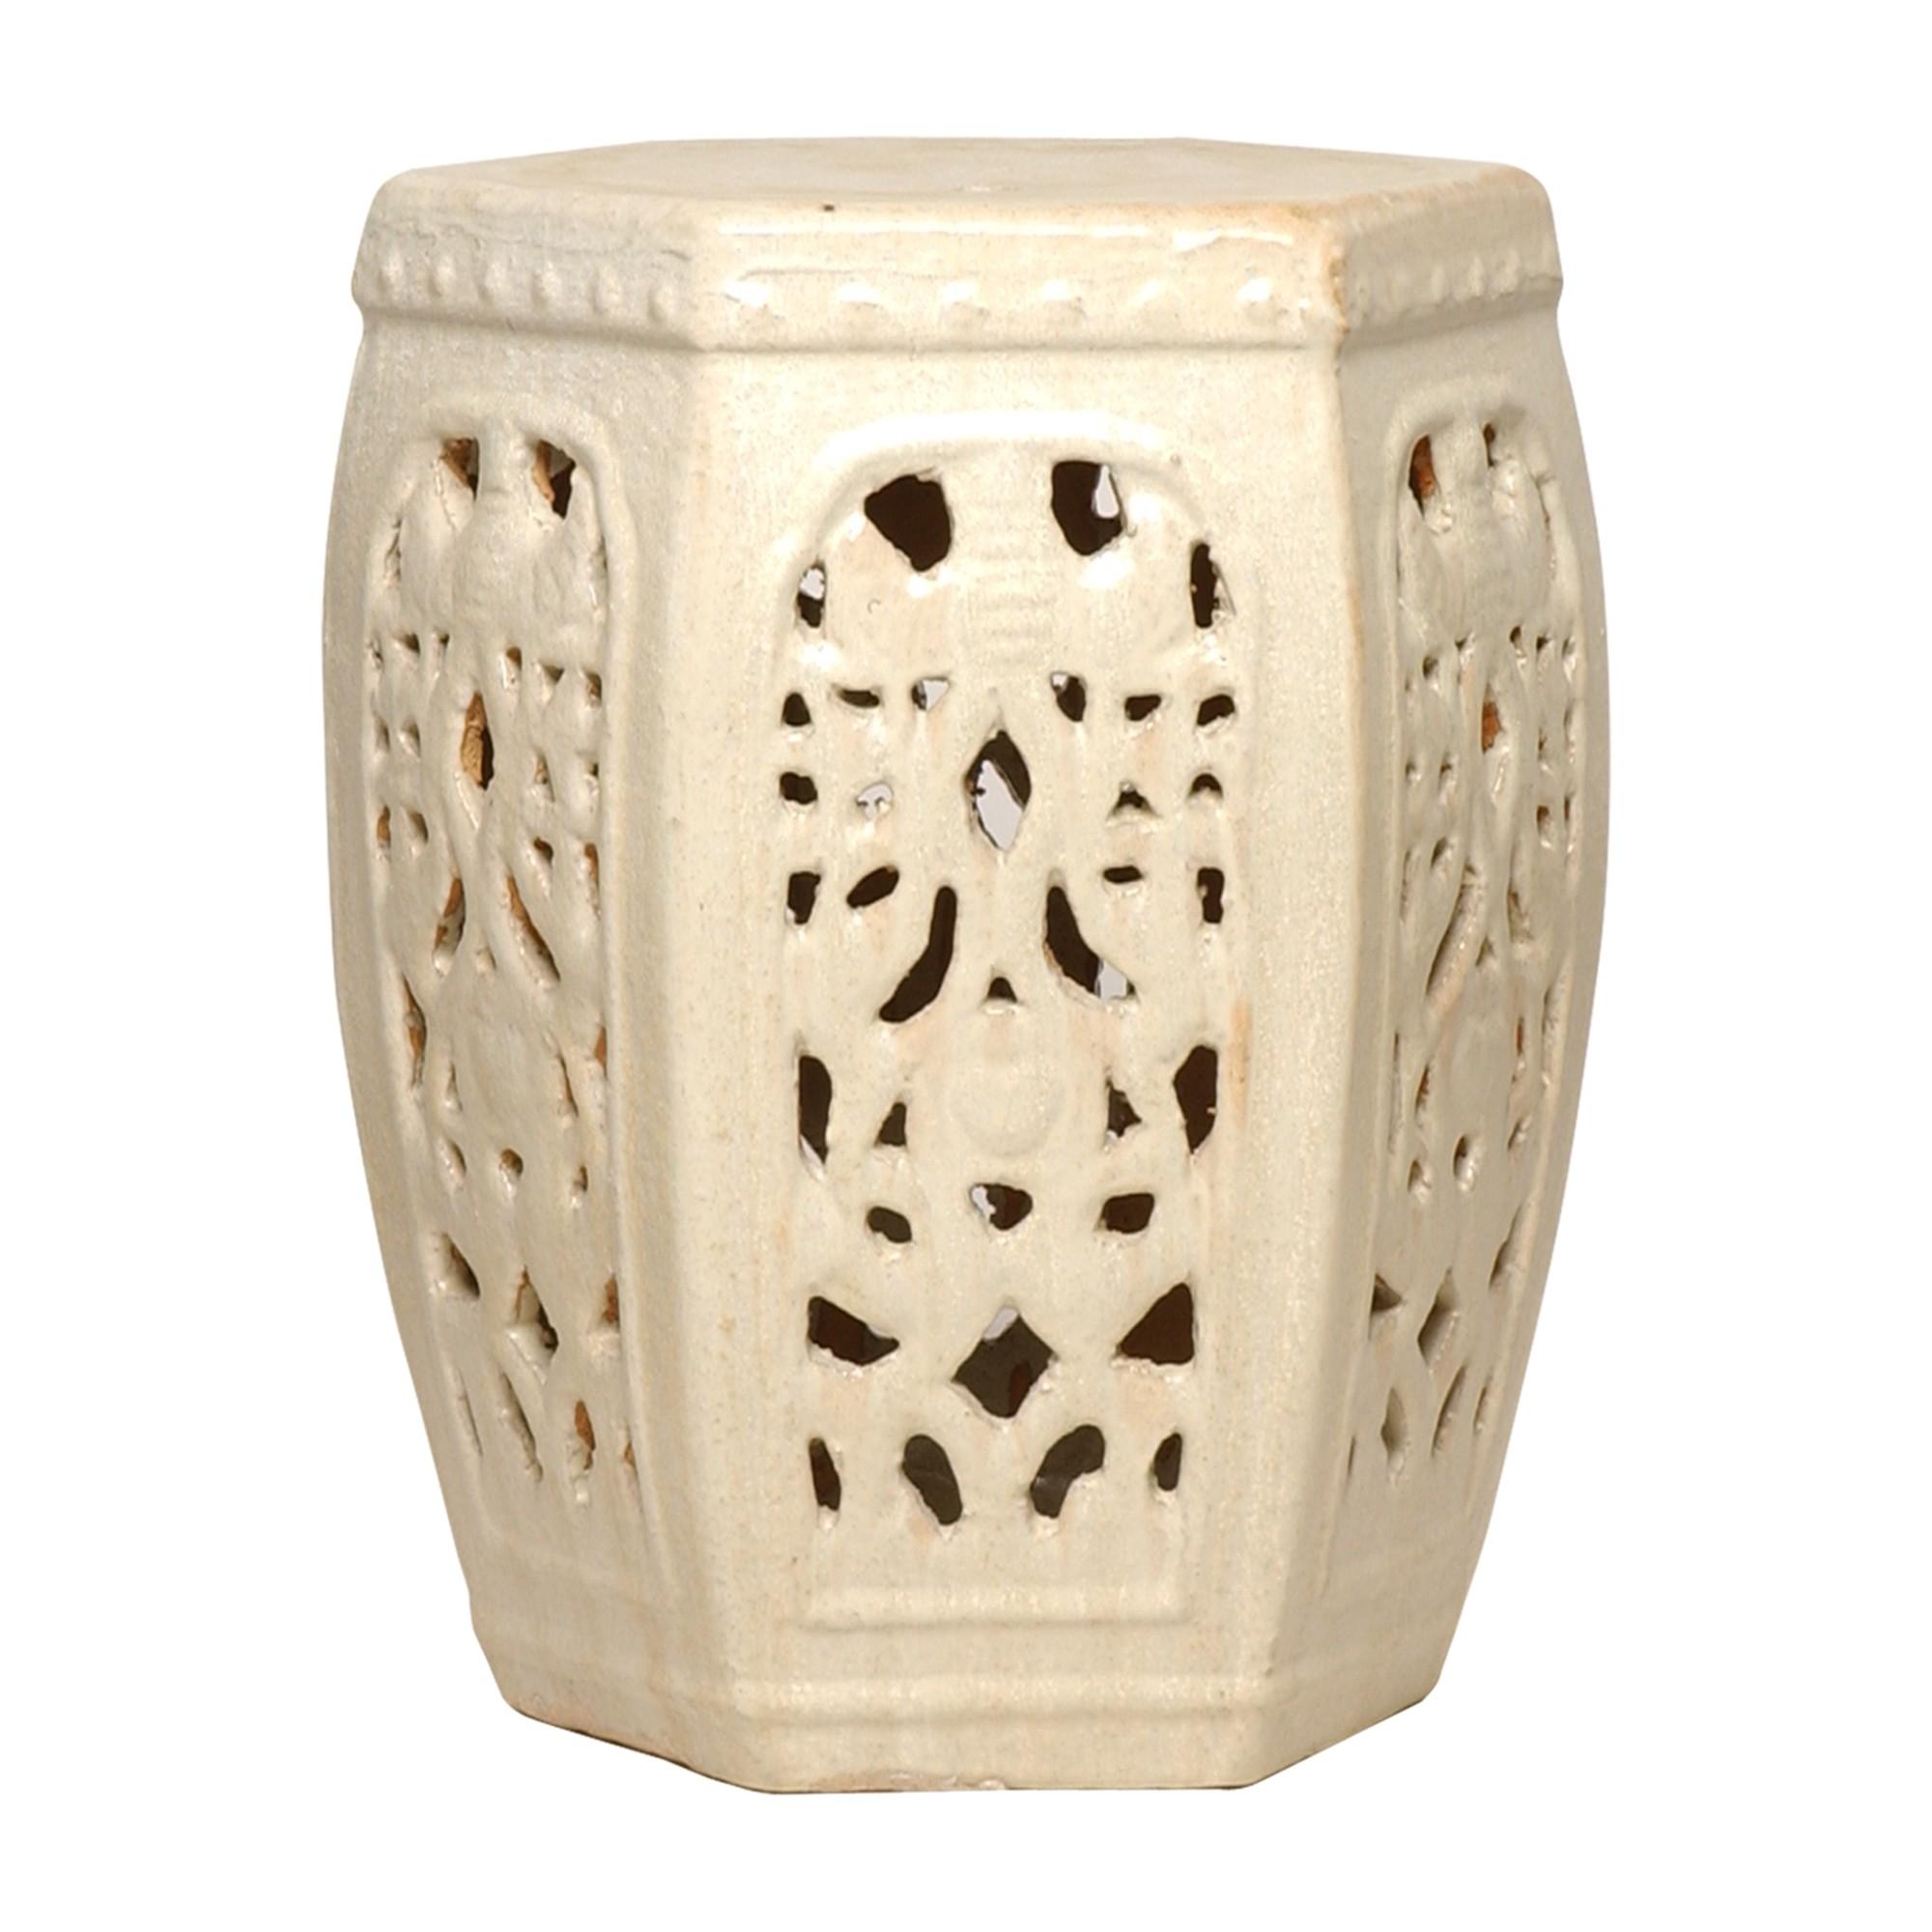 Superb Hexagon Ceramic Asian Garden Stool